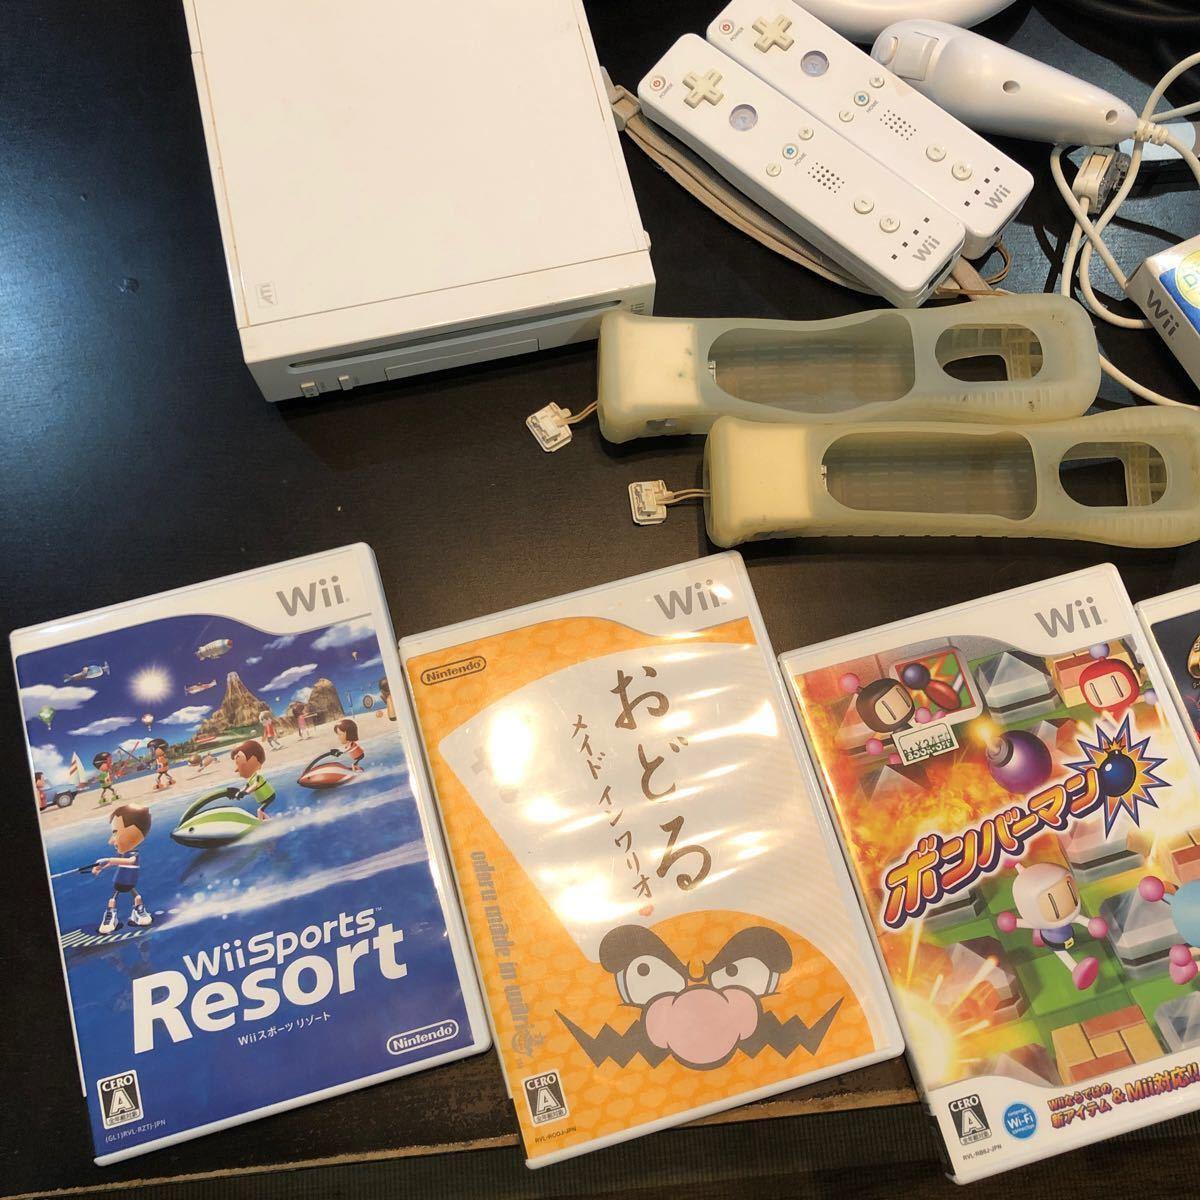 『Wii本体+ソフト9本セット』届いて直ぐに遊べます(動作確認済み)    Wii本体=箱・説明書無し ソフト=箱・説明書全てあり